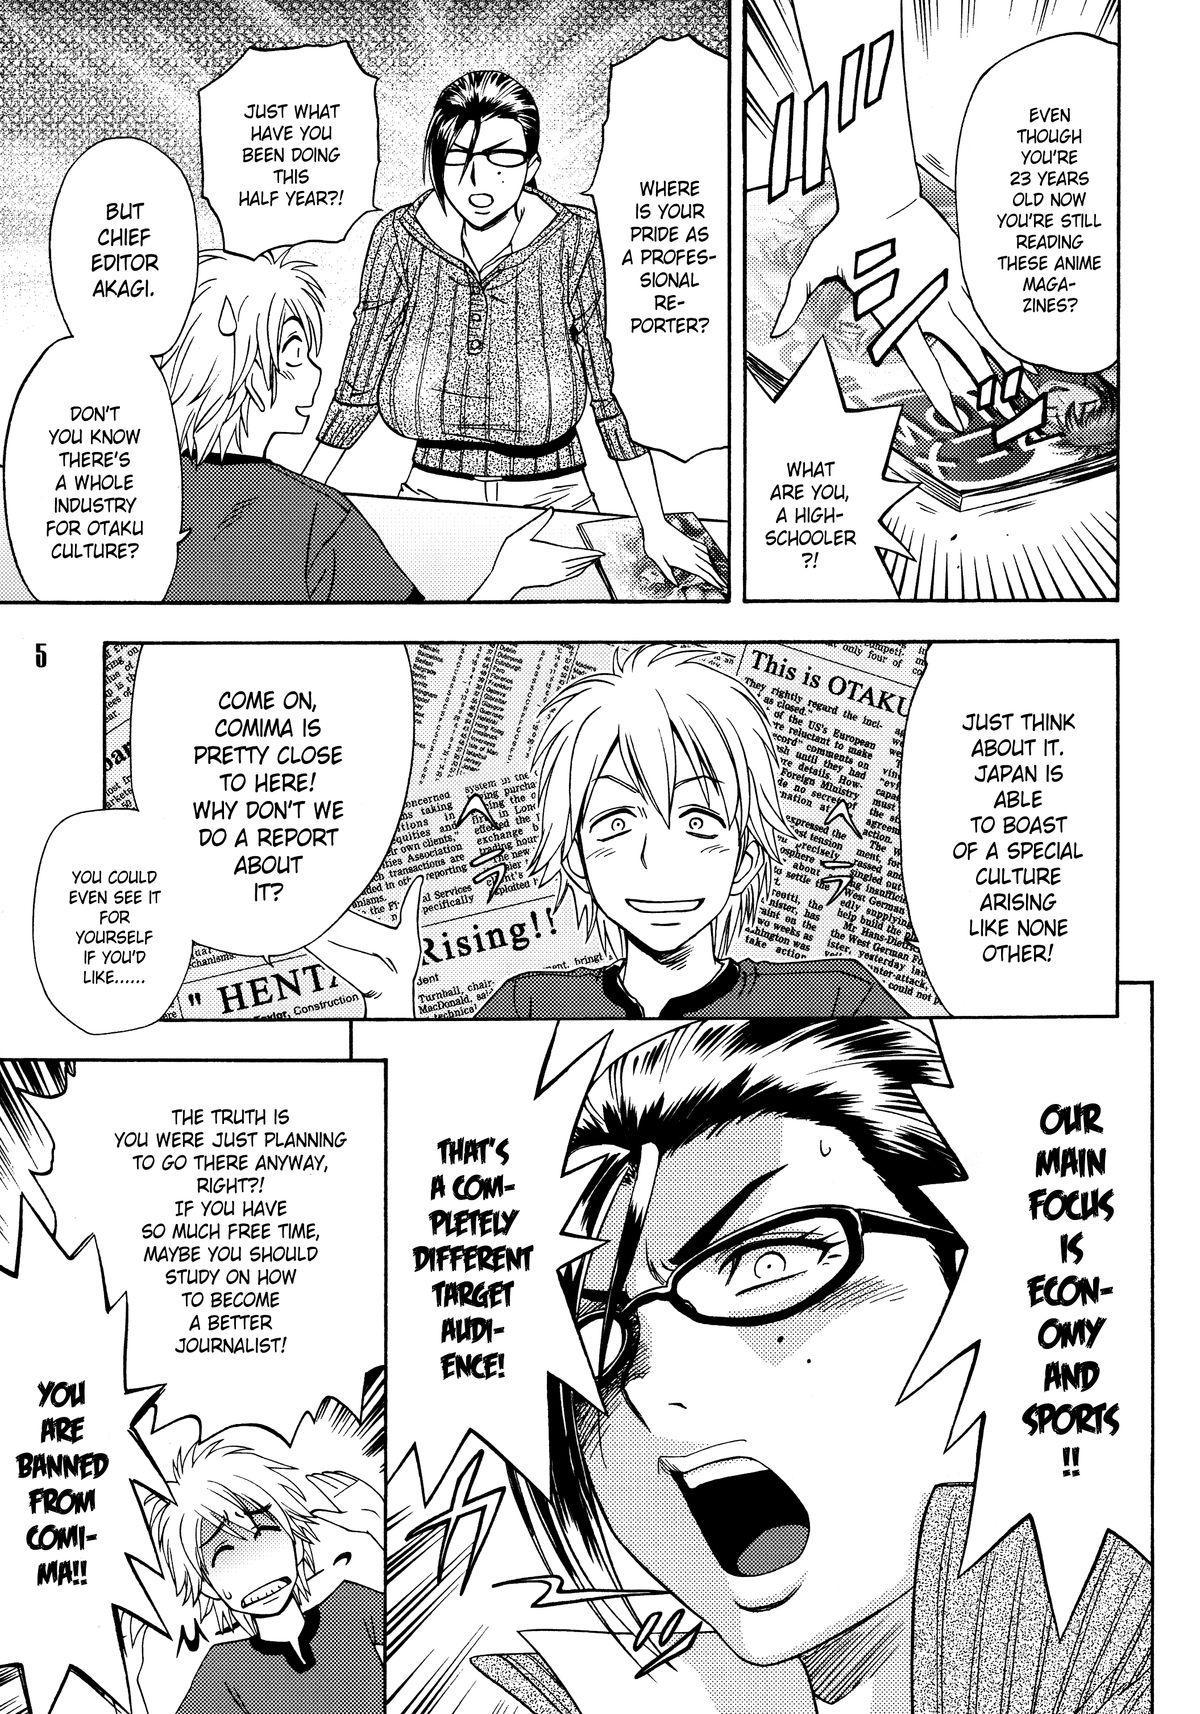 [Madam Project (Tatsunami Youtoku)] Bijin Henshuu-chou no Himitsu (1)   Beautiful Editor-in-Chief's Secret (1) [English] [Forbiddenfetish77] [Decensored] 4